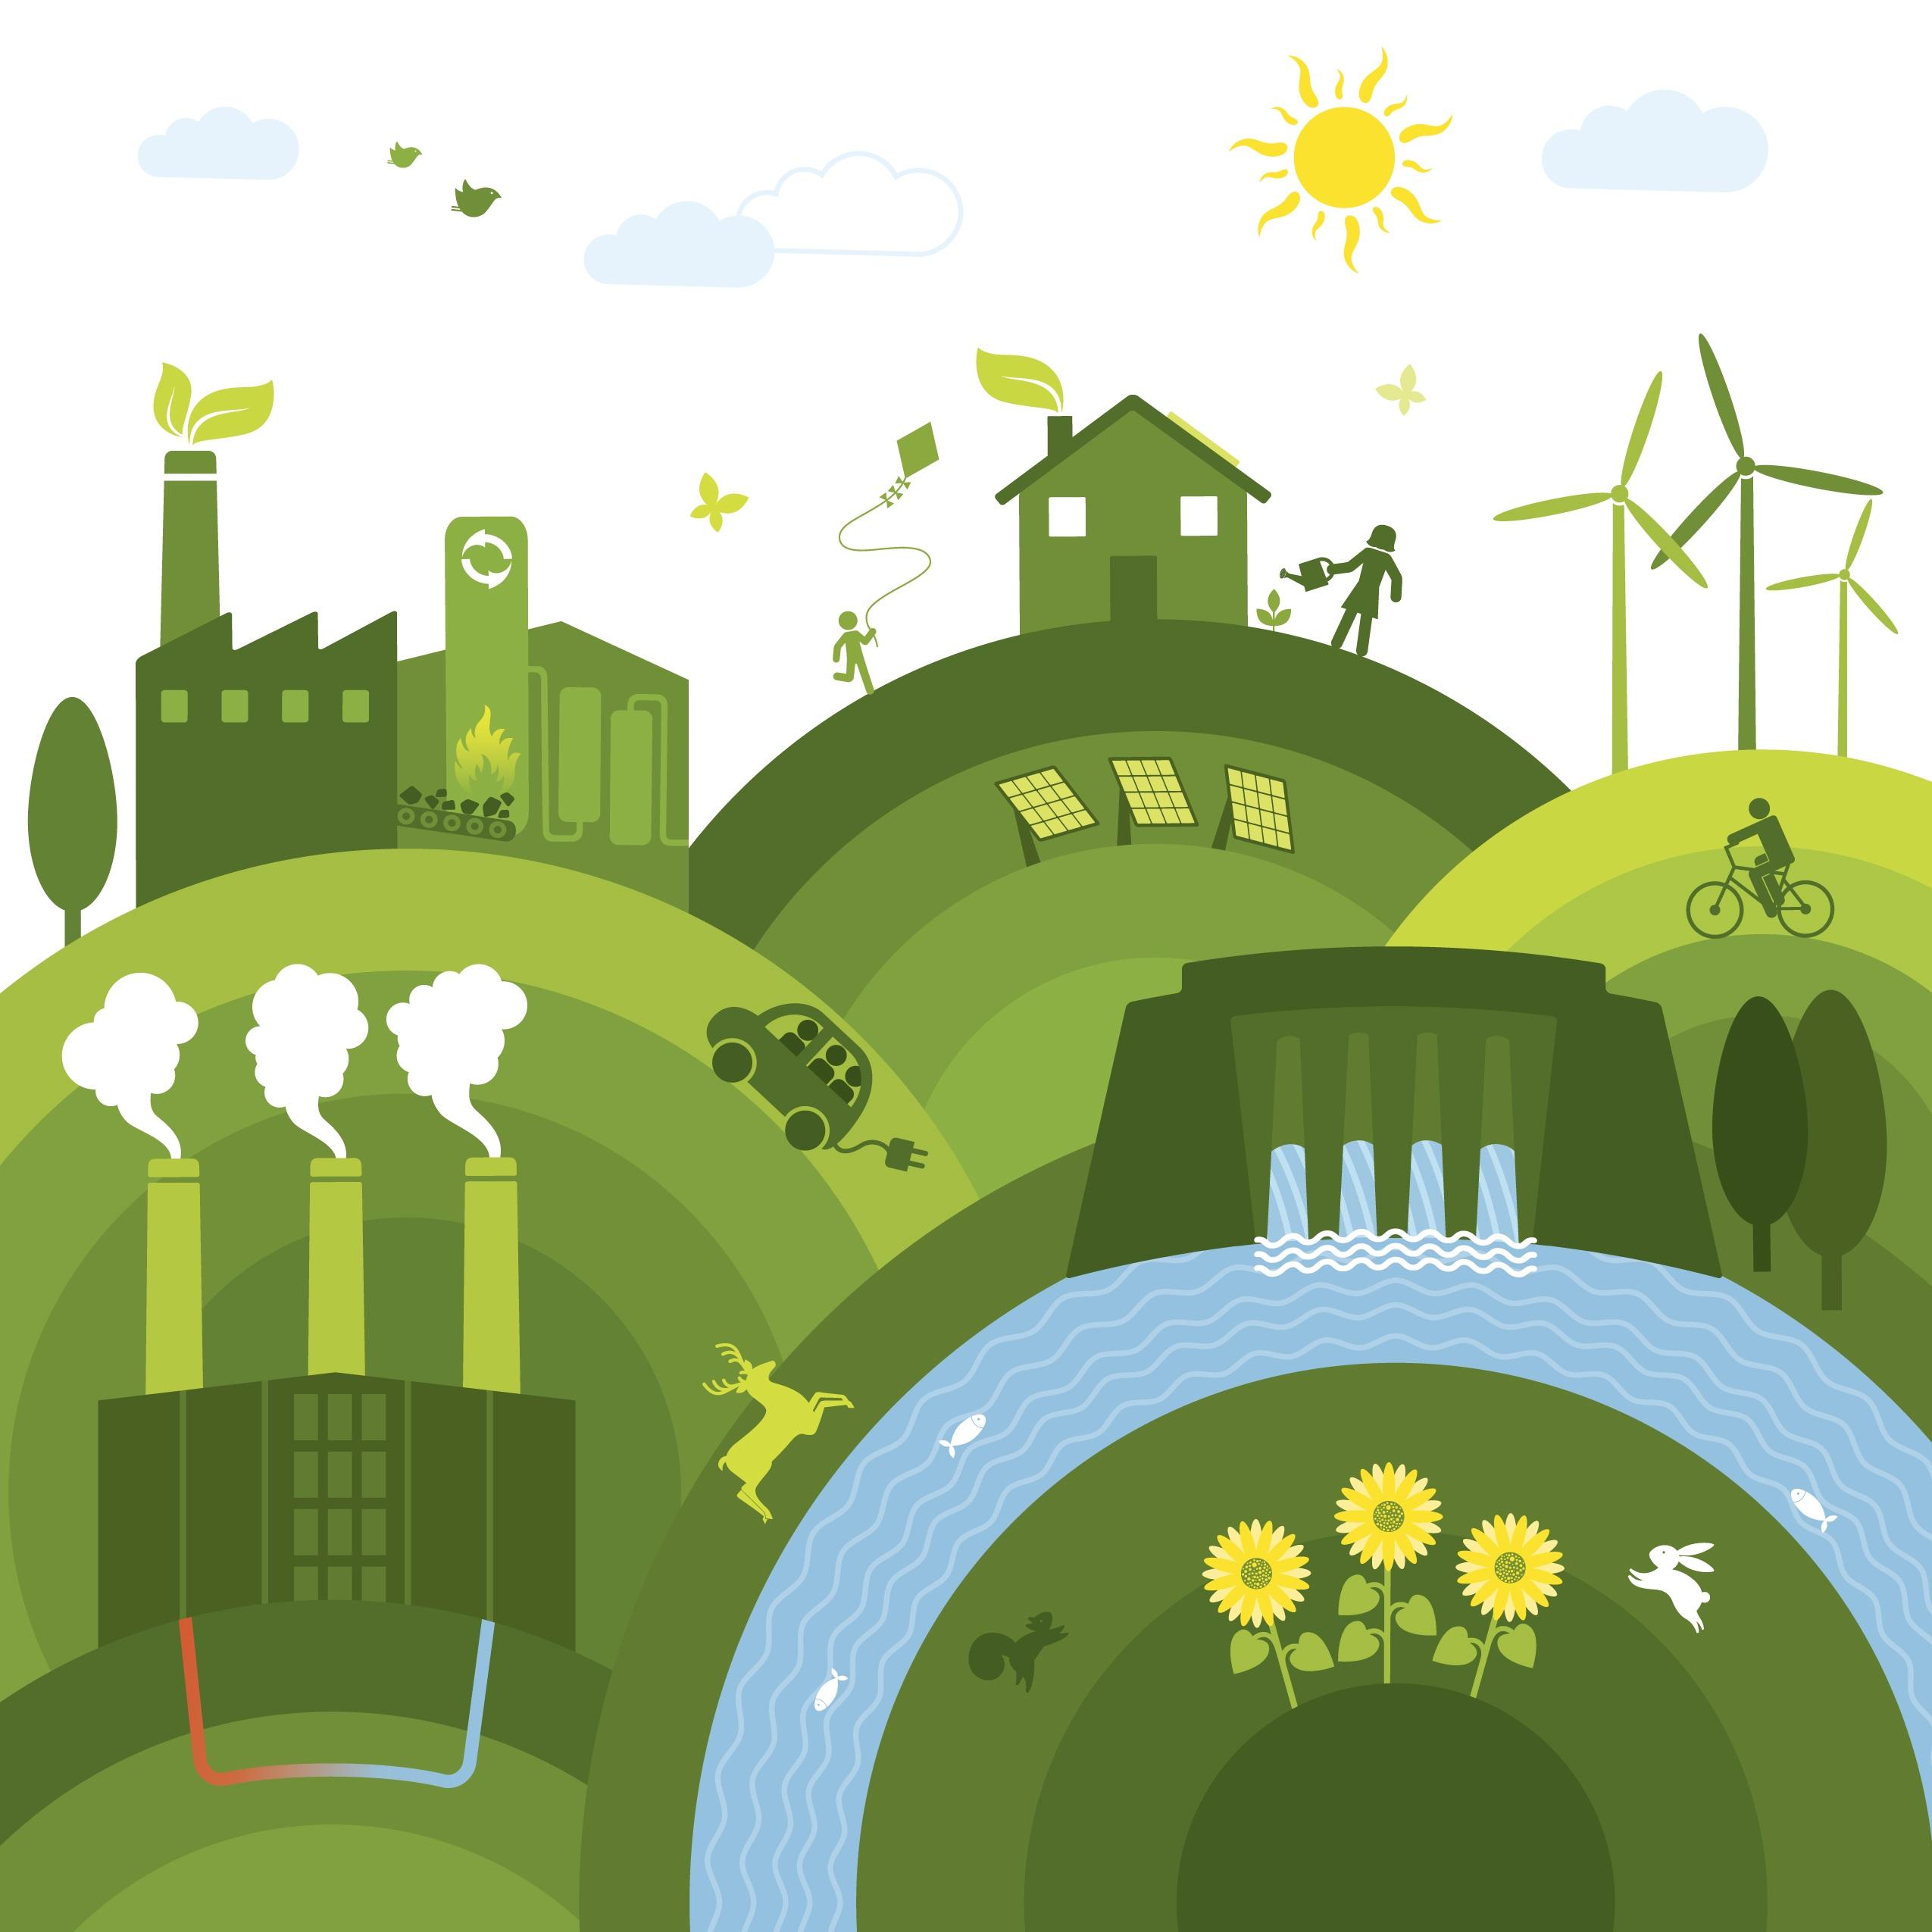 Renewable_energy_sources